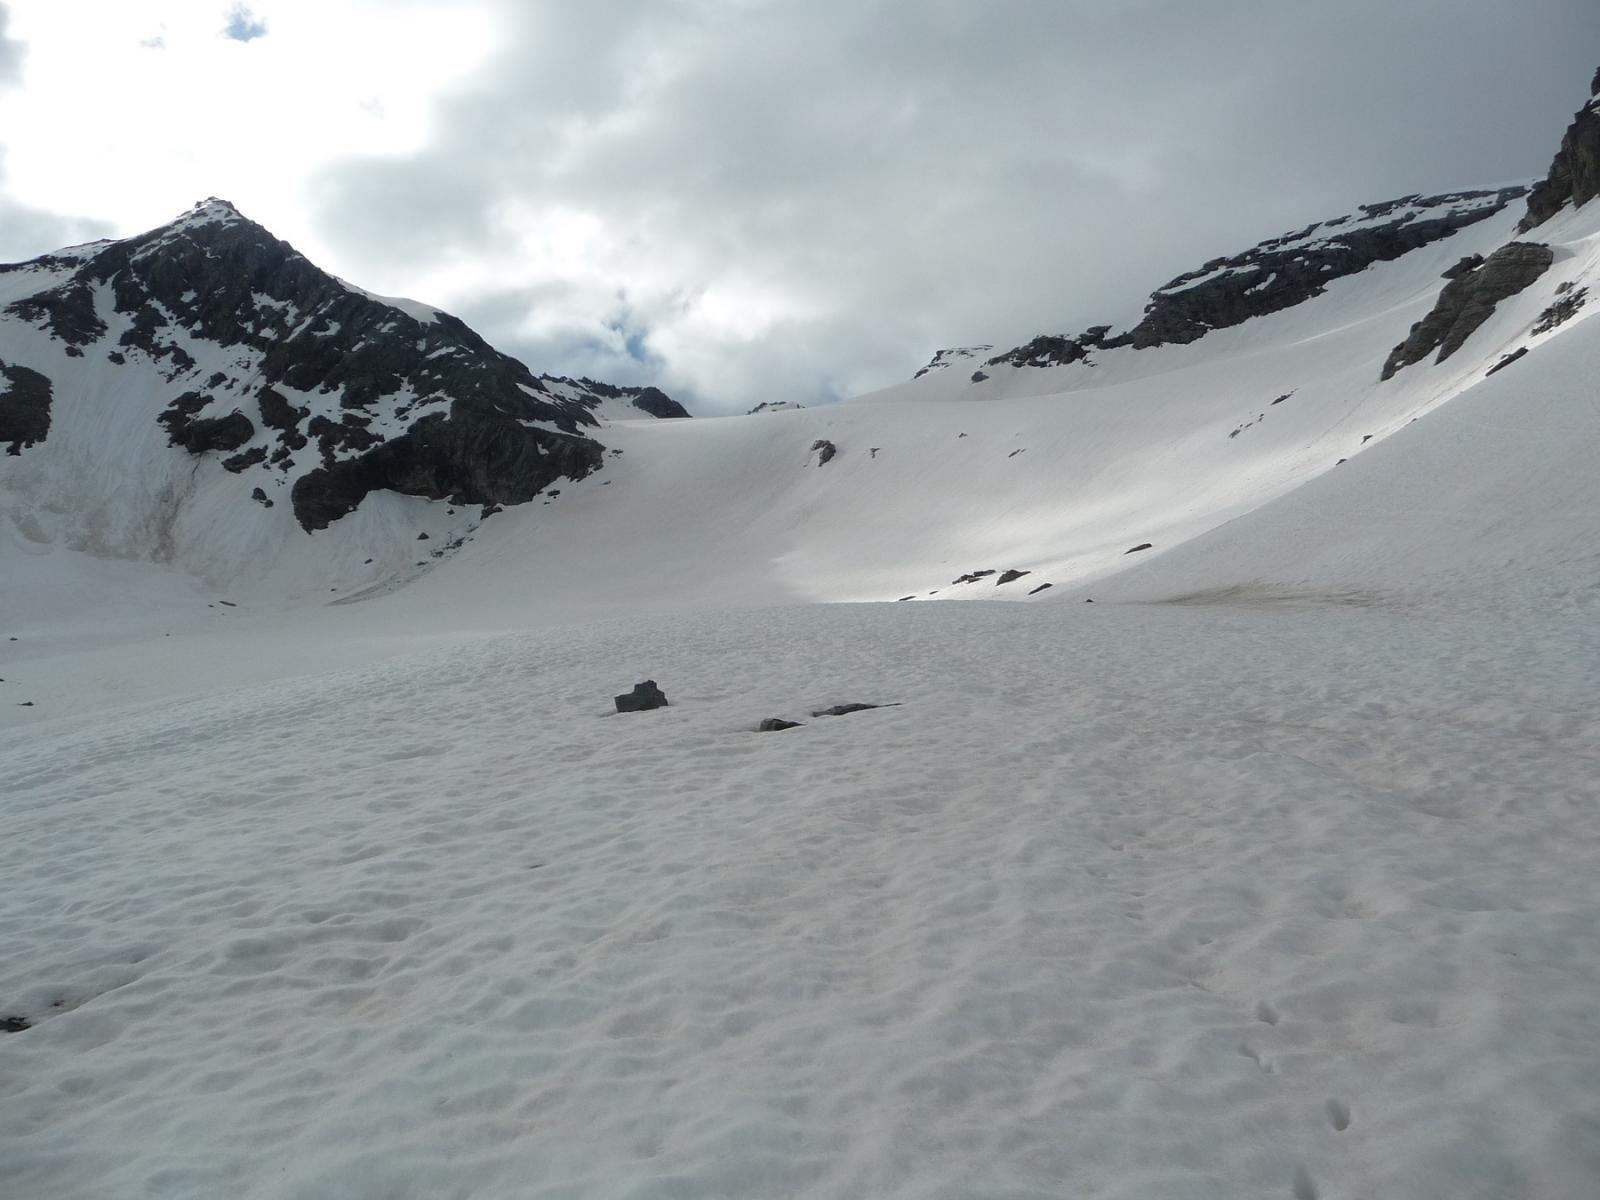 Innevamento sul ghiacciaio